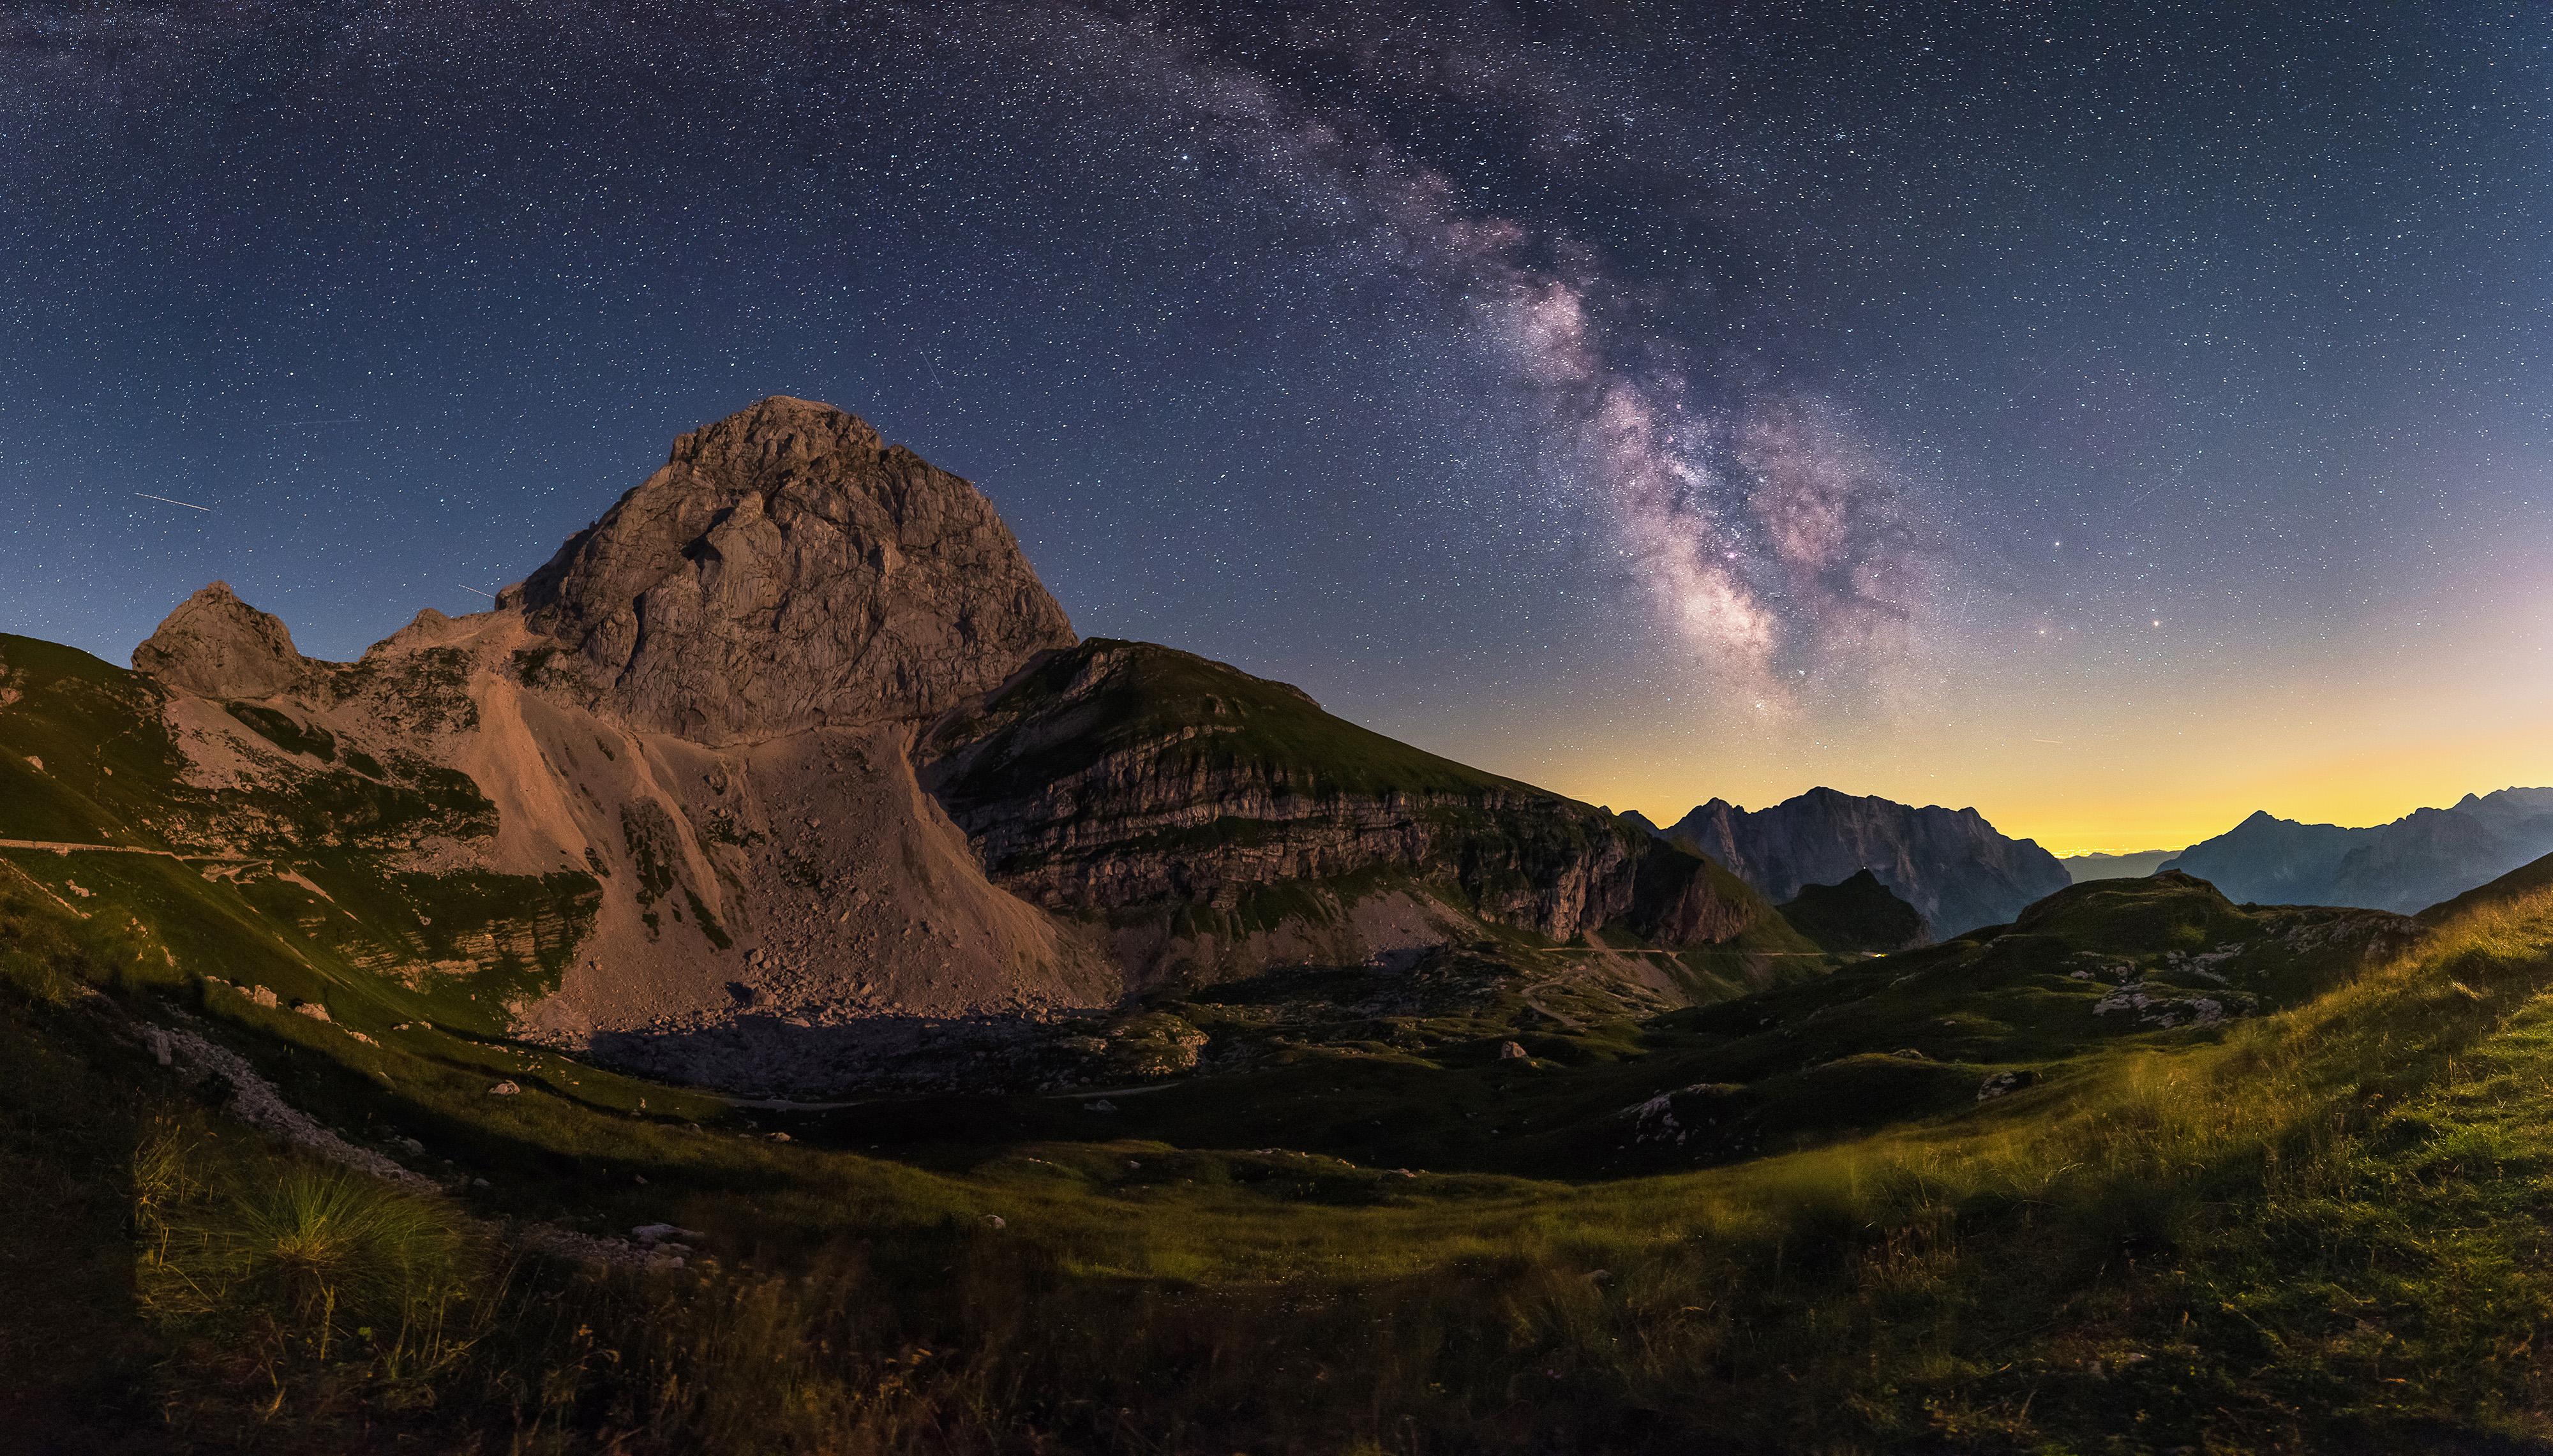 Milky Way over the Mangart